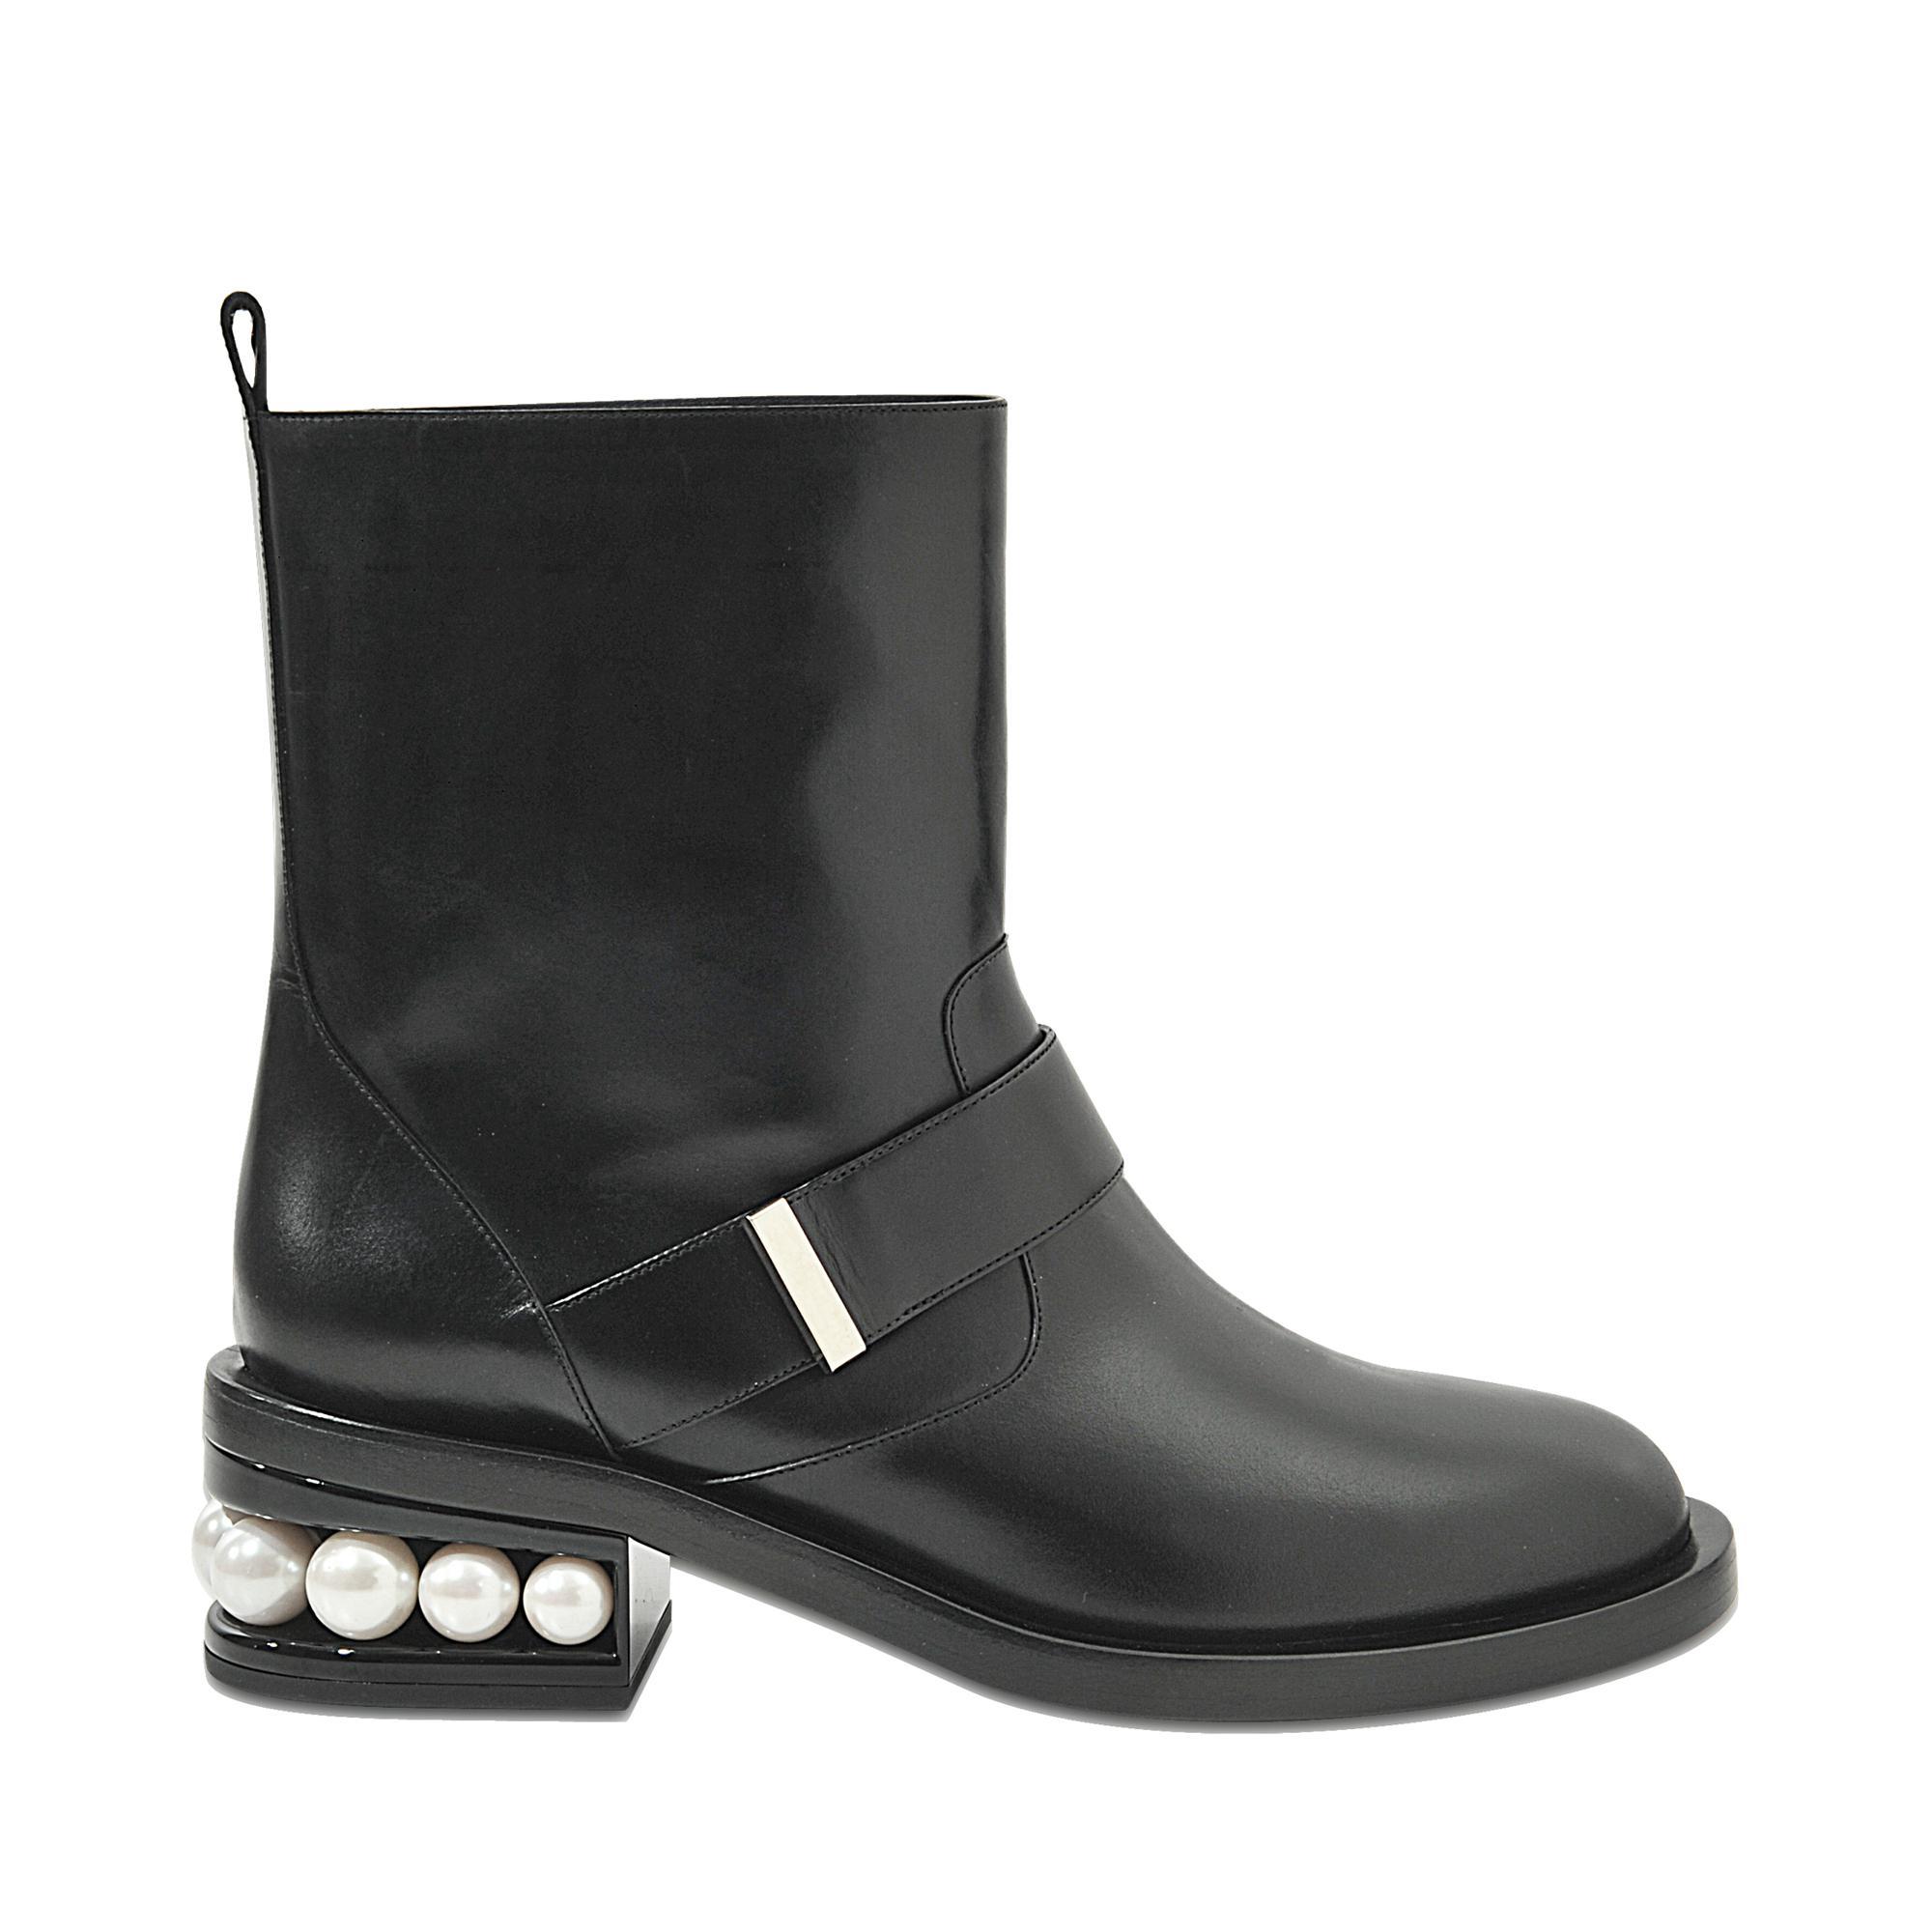 Nicholas Kirkwood Velvet Casati Pearl Biker boots